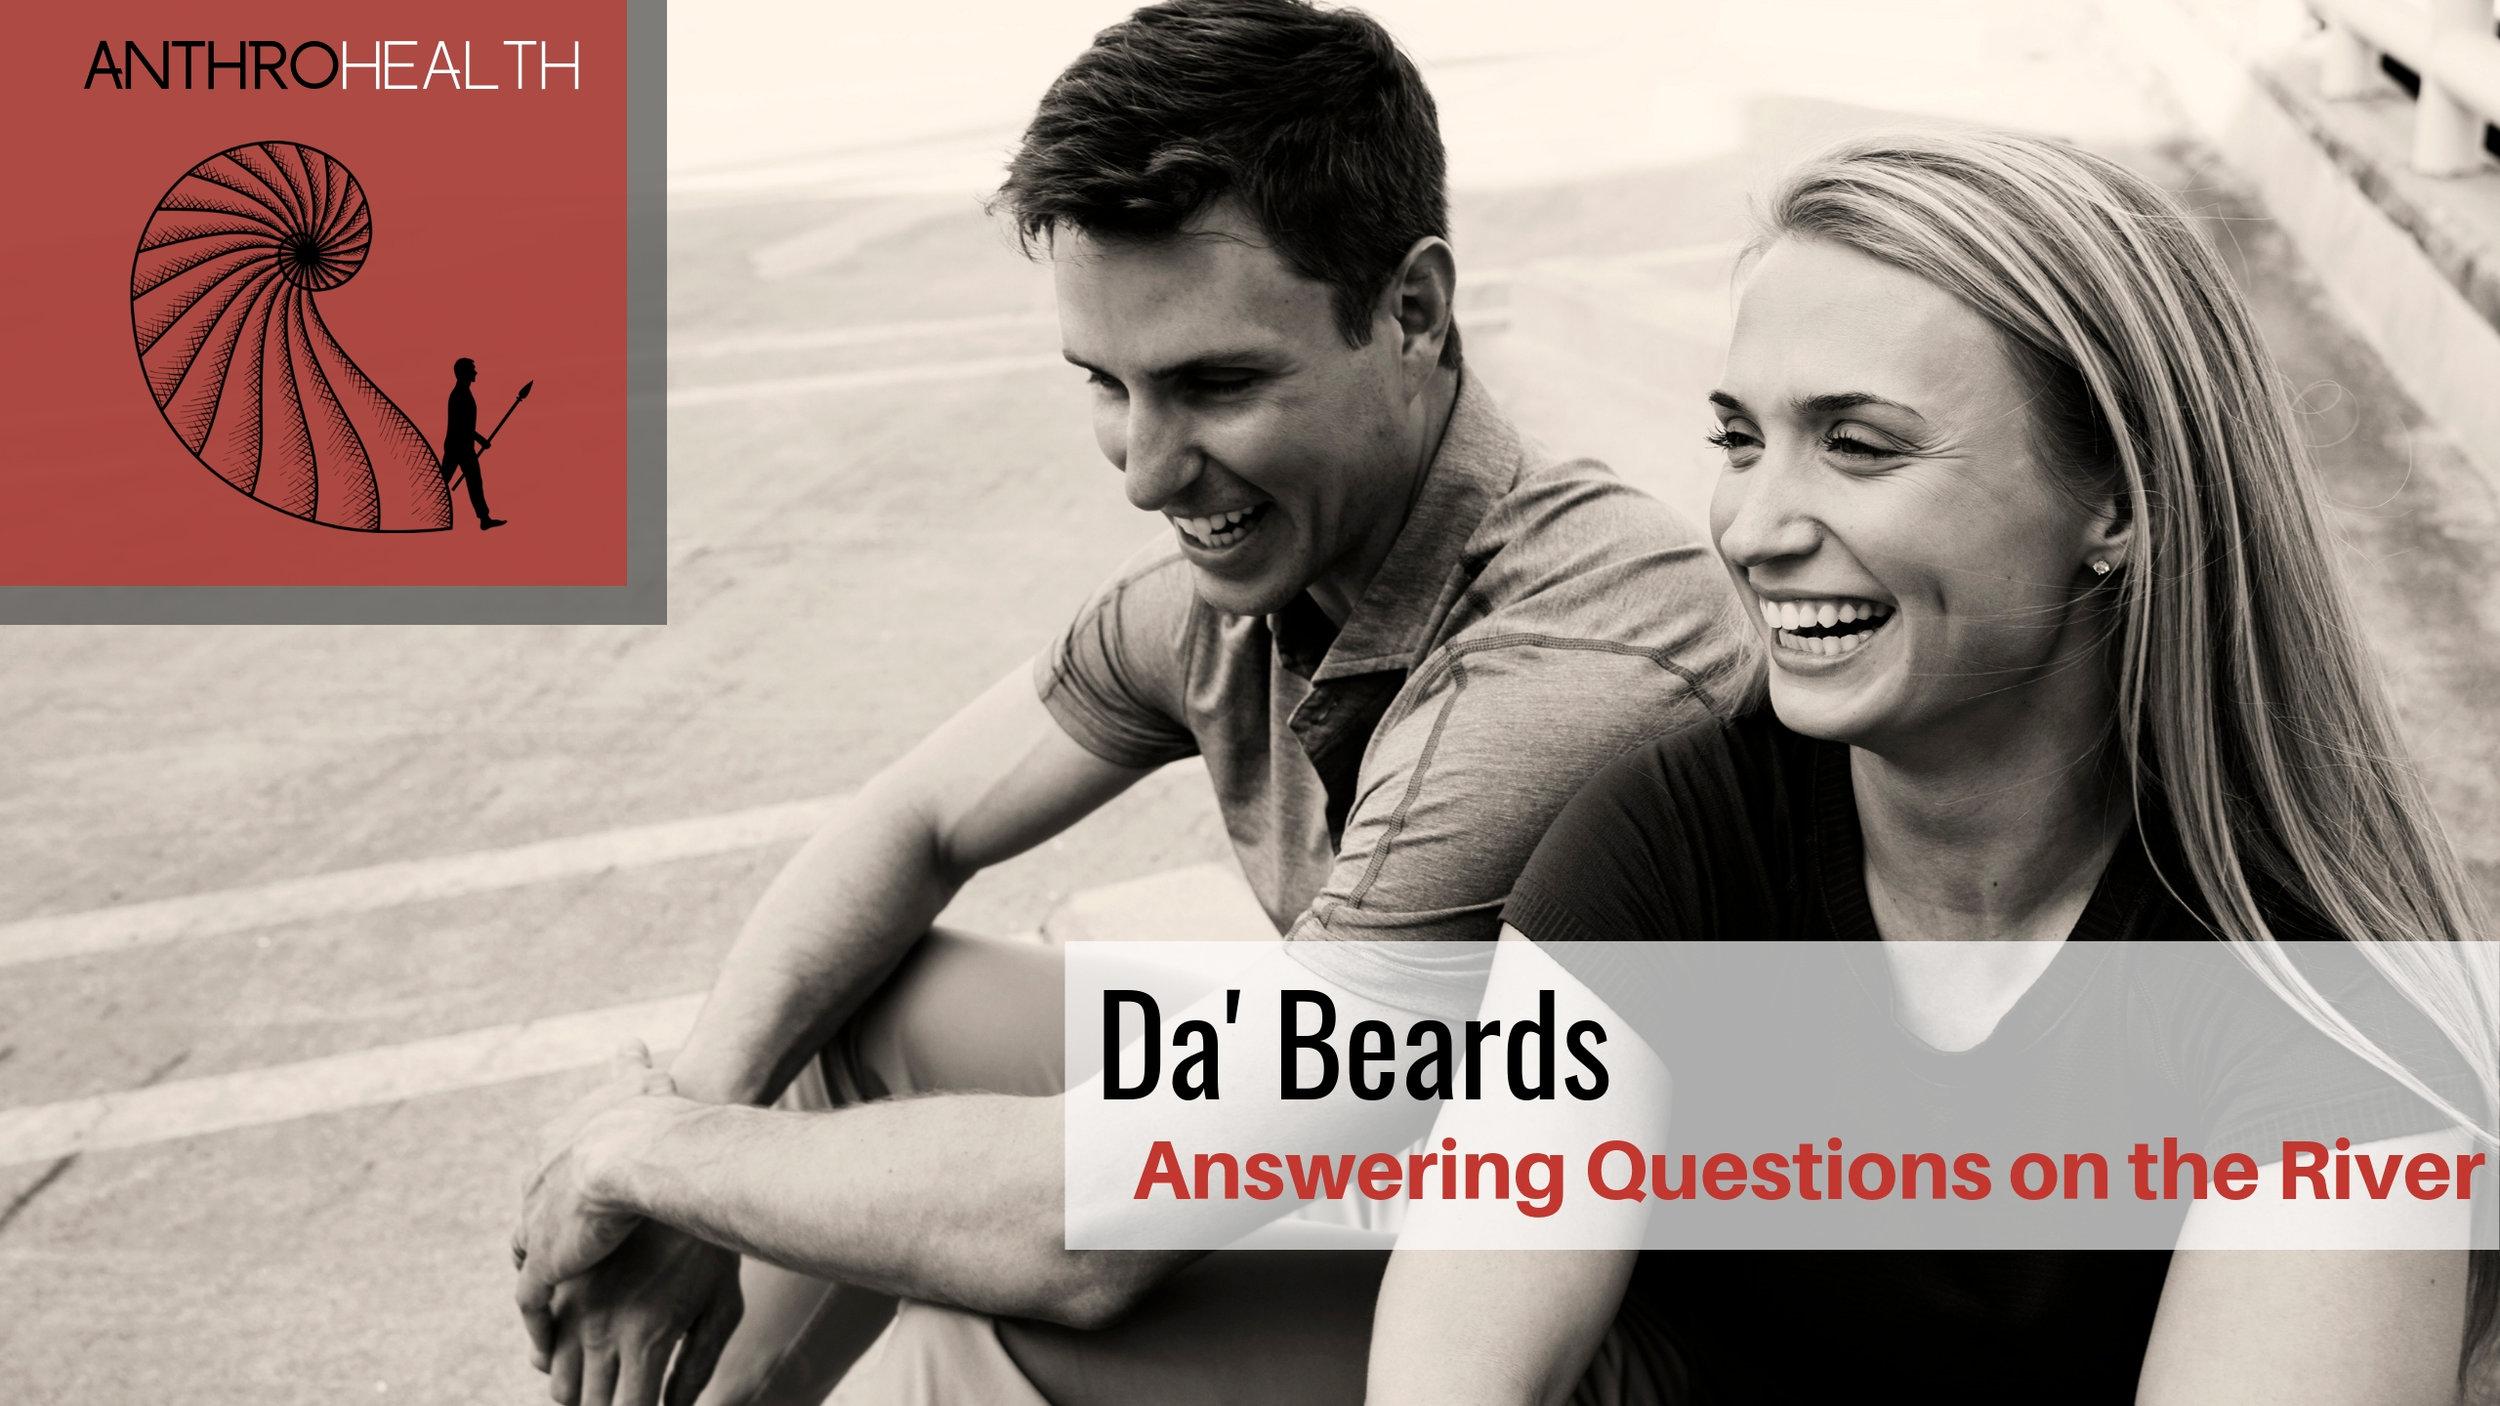 AnthroHealth Podcast - Da' Beards on Da' River